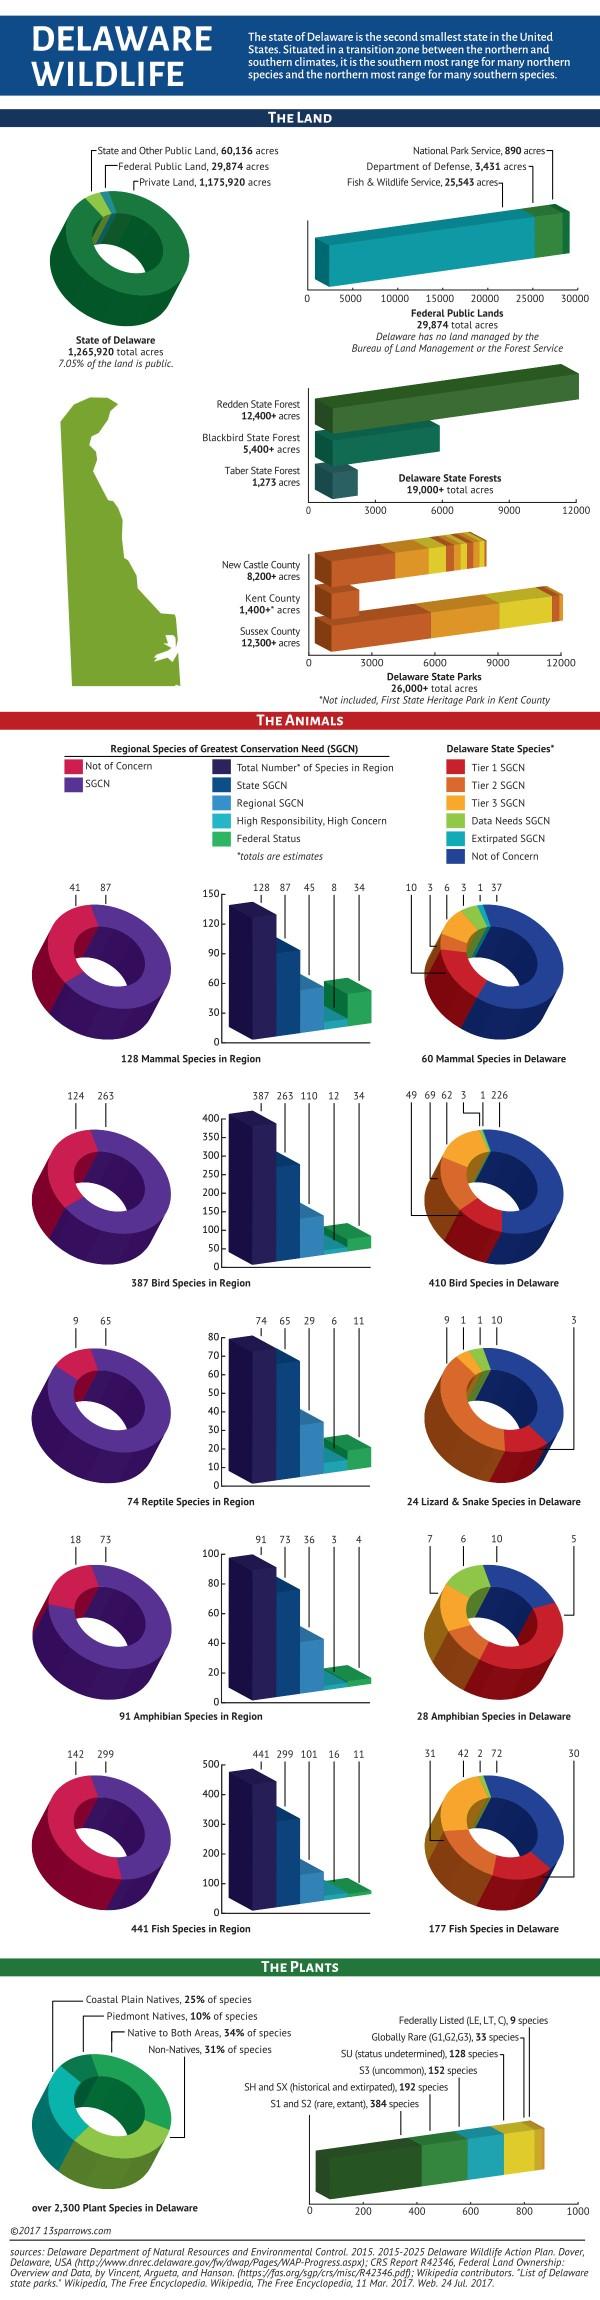 wild delaware infographic